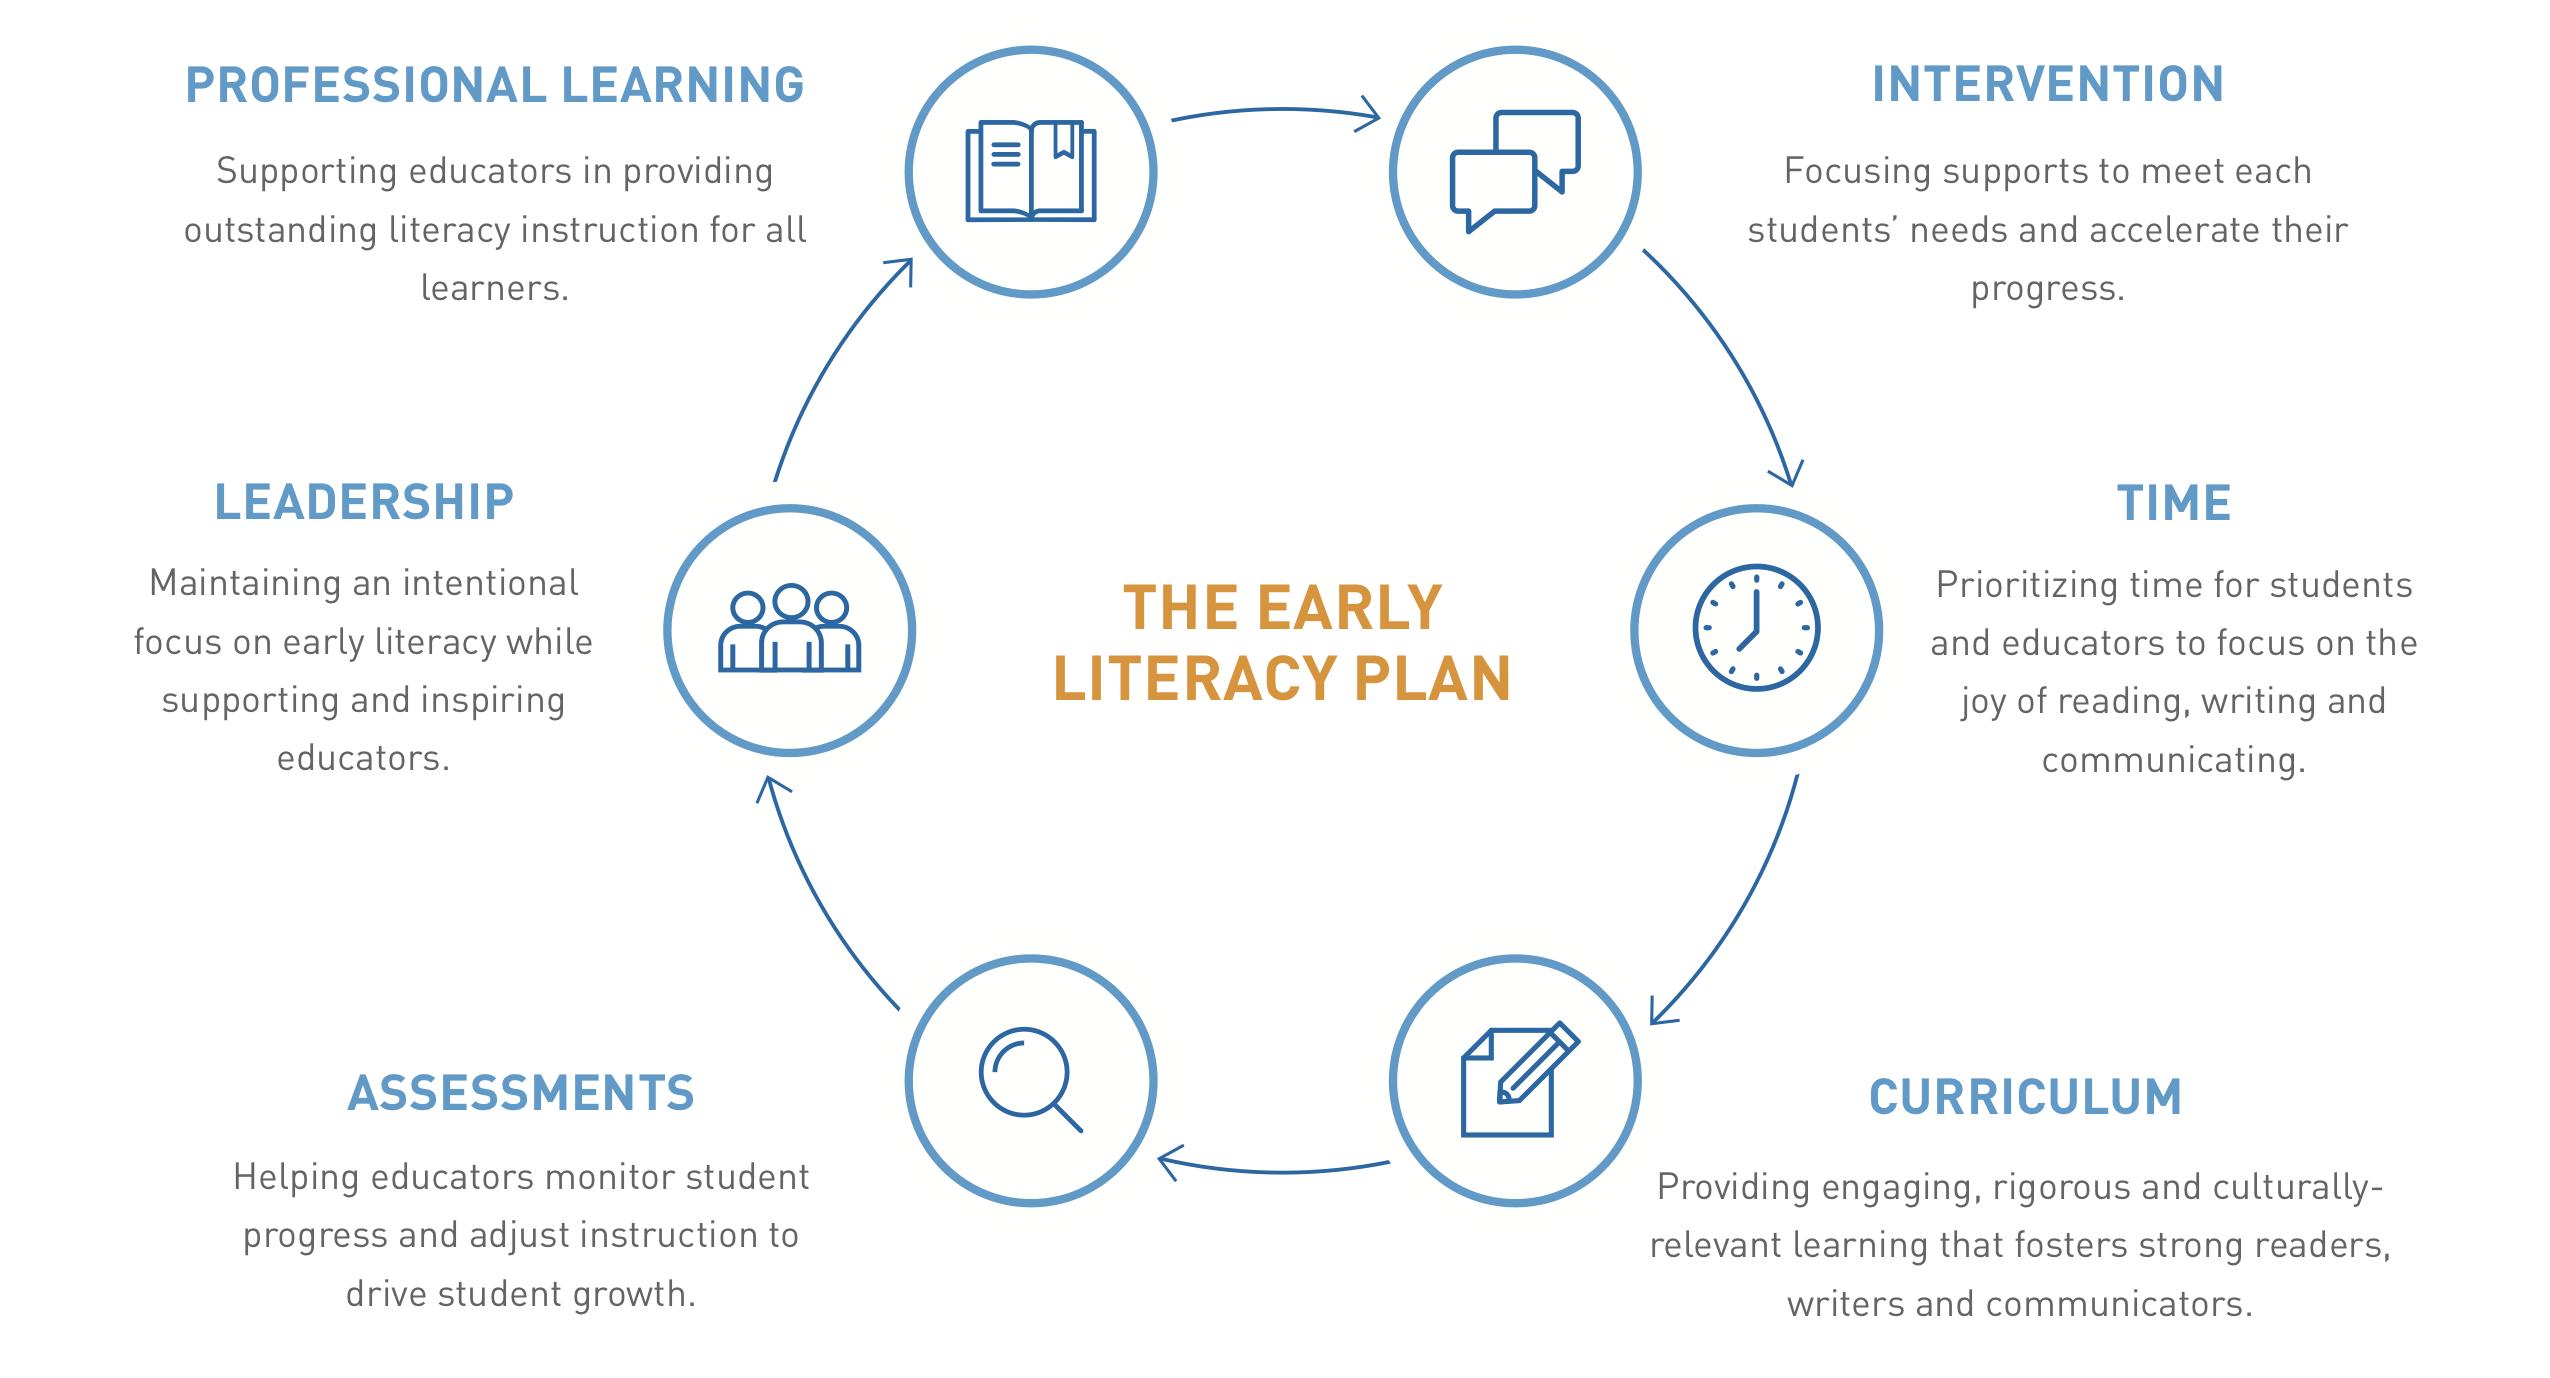 early literacy priorities